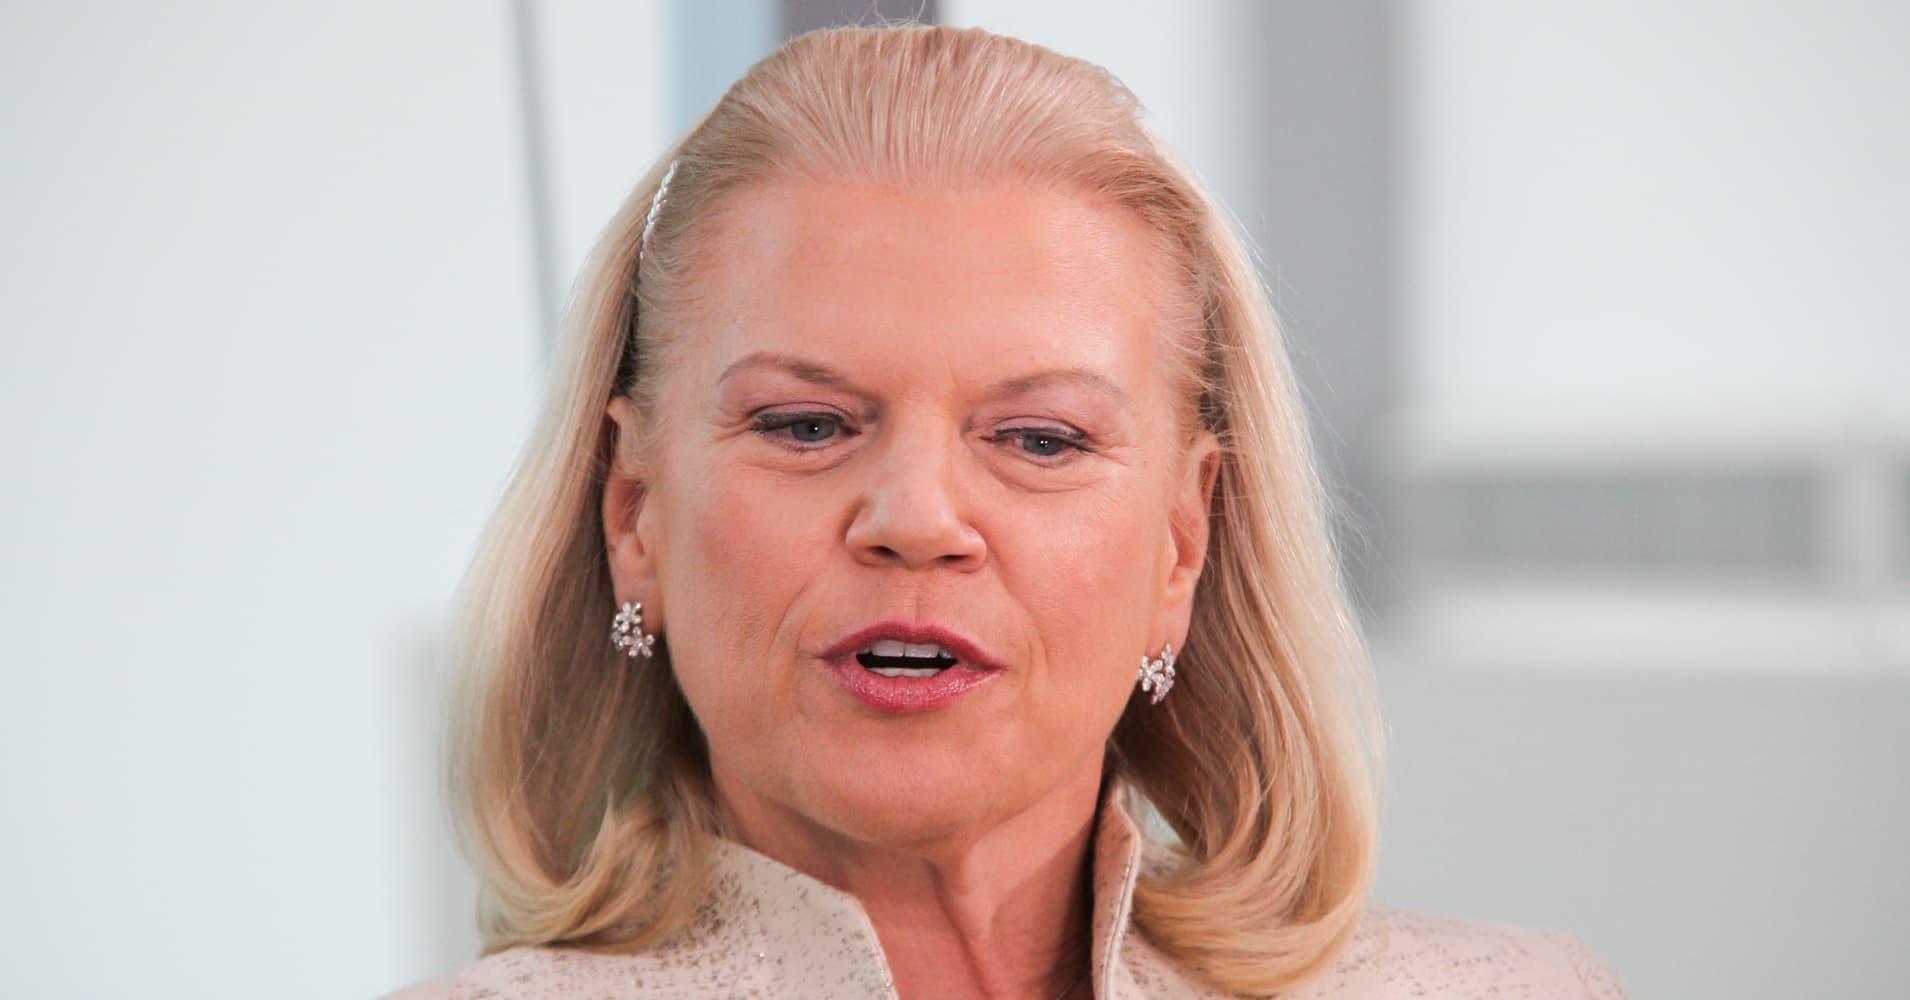 The US needs tax reform and job retraining programs, says IBM CEO